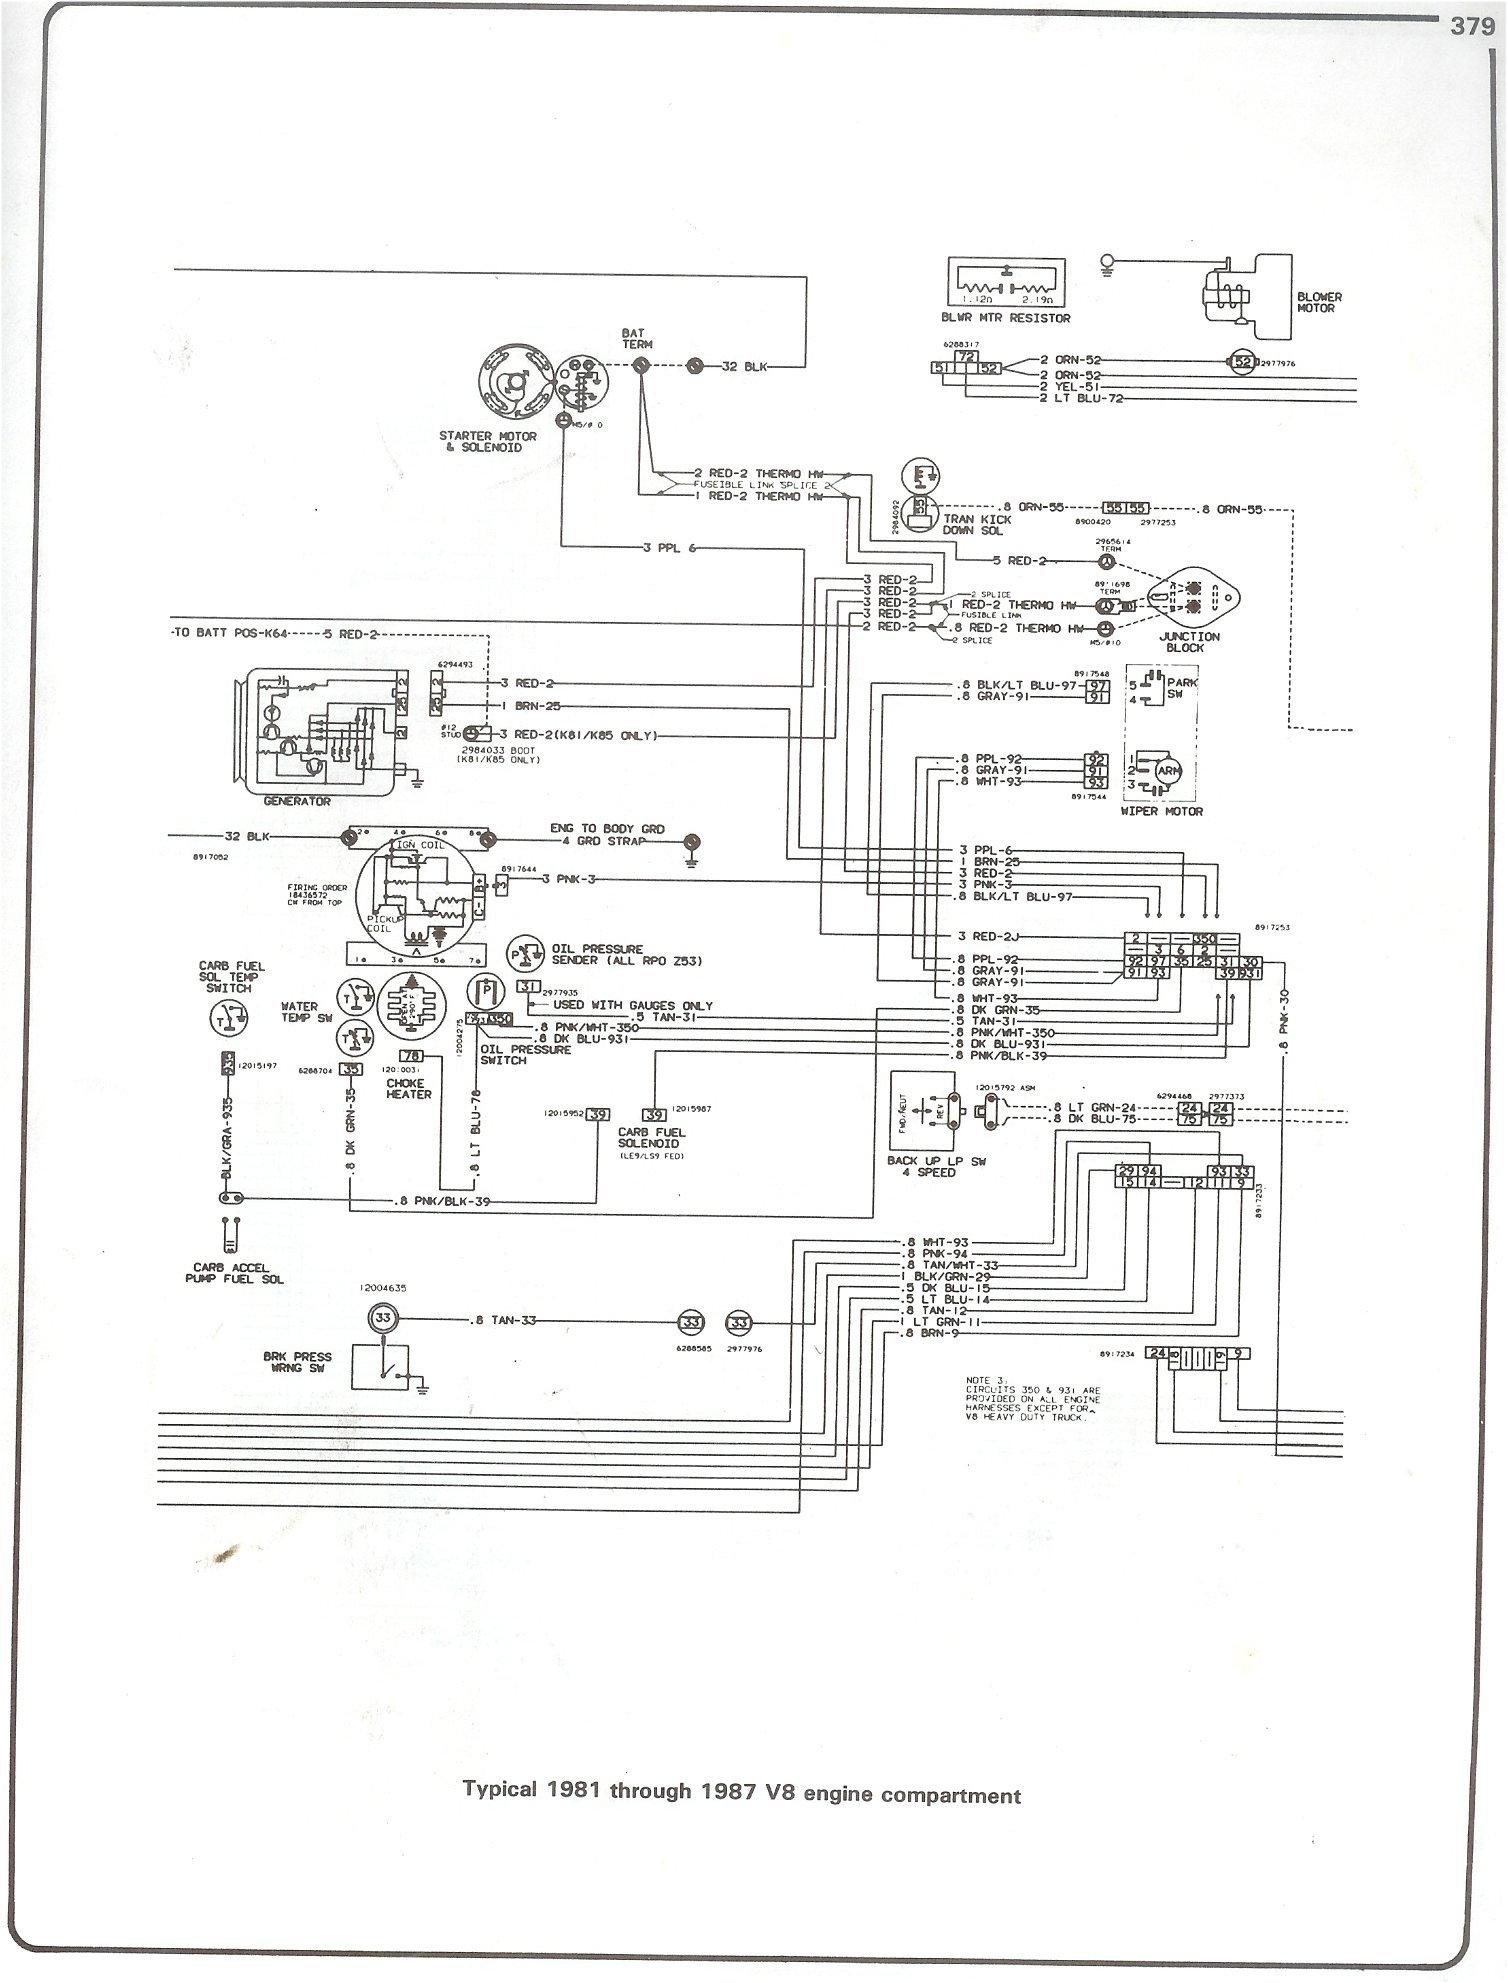 81 87_V8_engine?resize=665%2C874 wiring harness diagram for 1984 chevy truck the wiring diagram 84 c10 wiring diagram at eliteediting.co